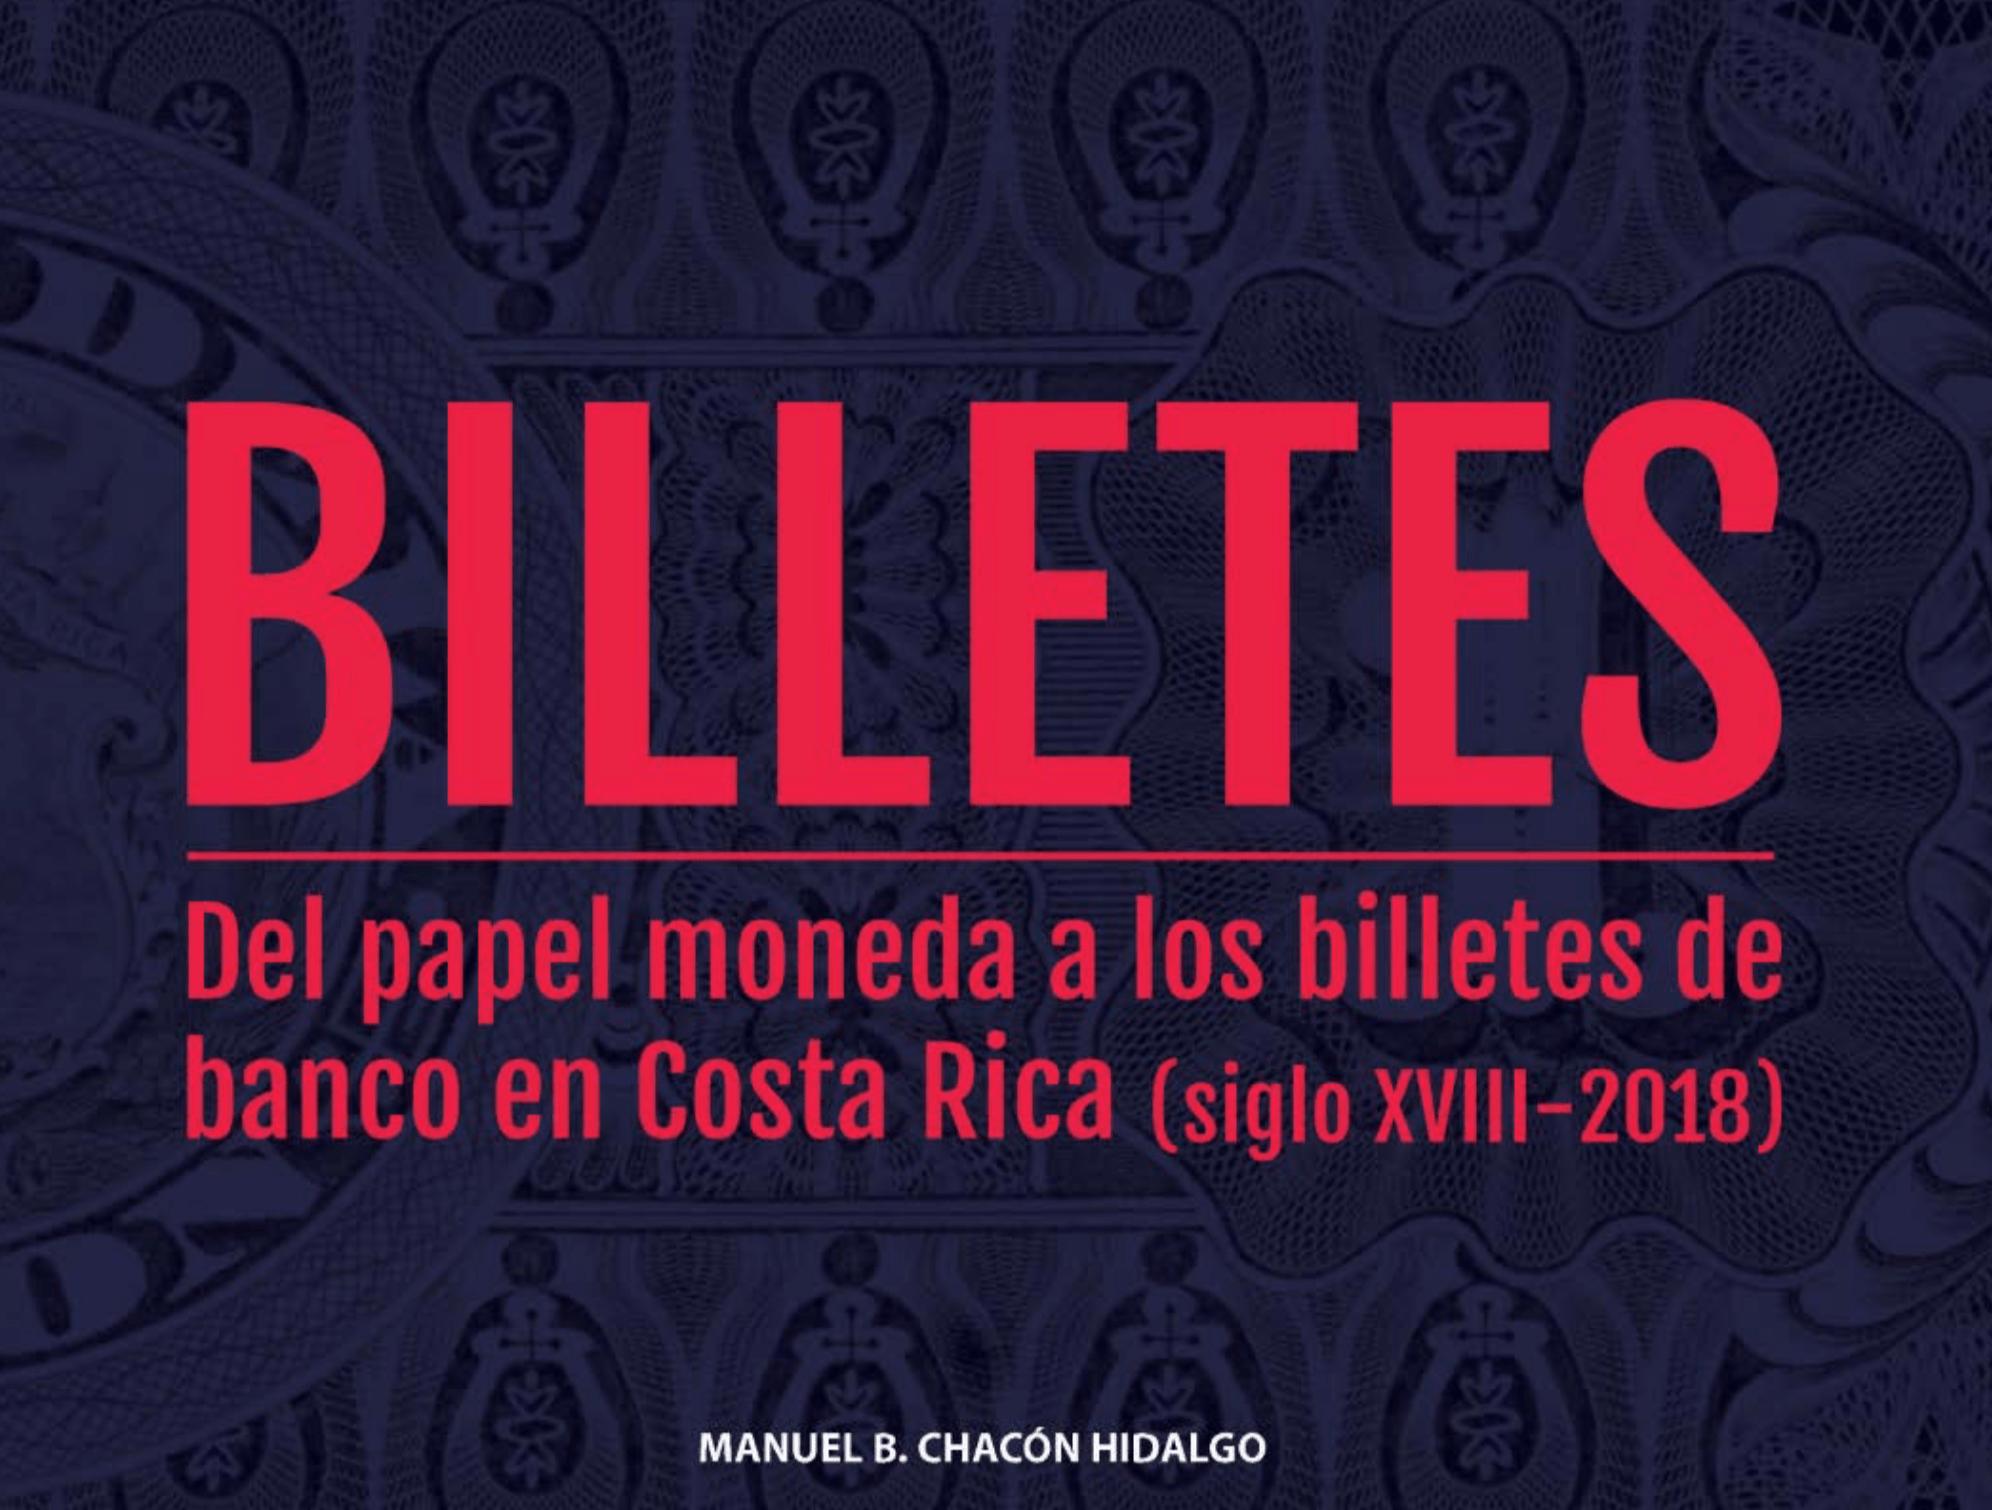 Billetes: del papel moneda a los billetes de banco (Siglo XVIII-2018)